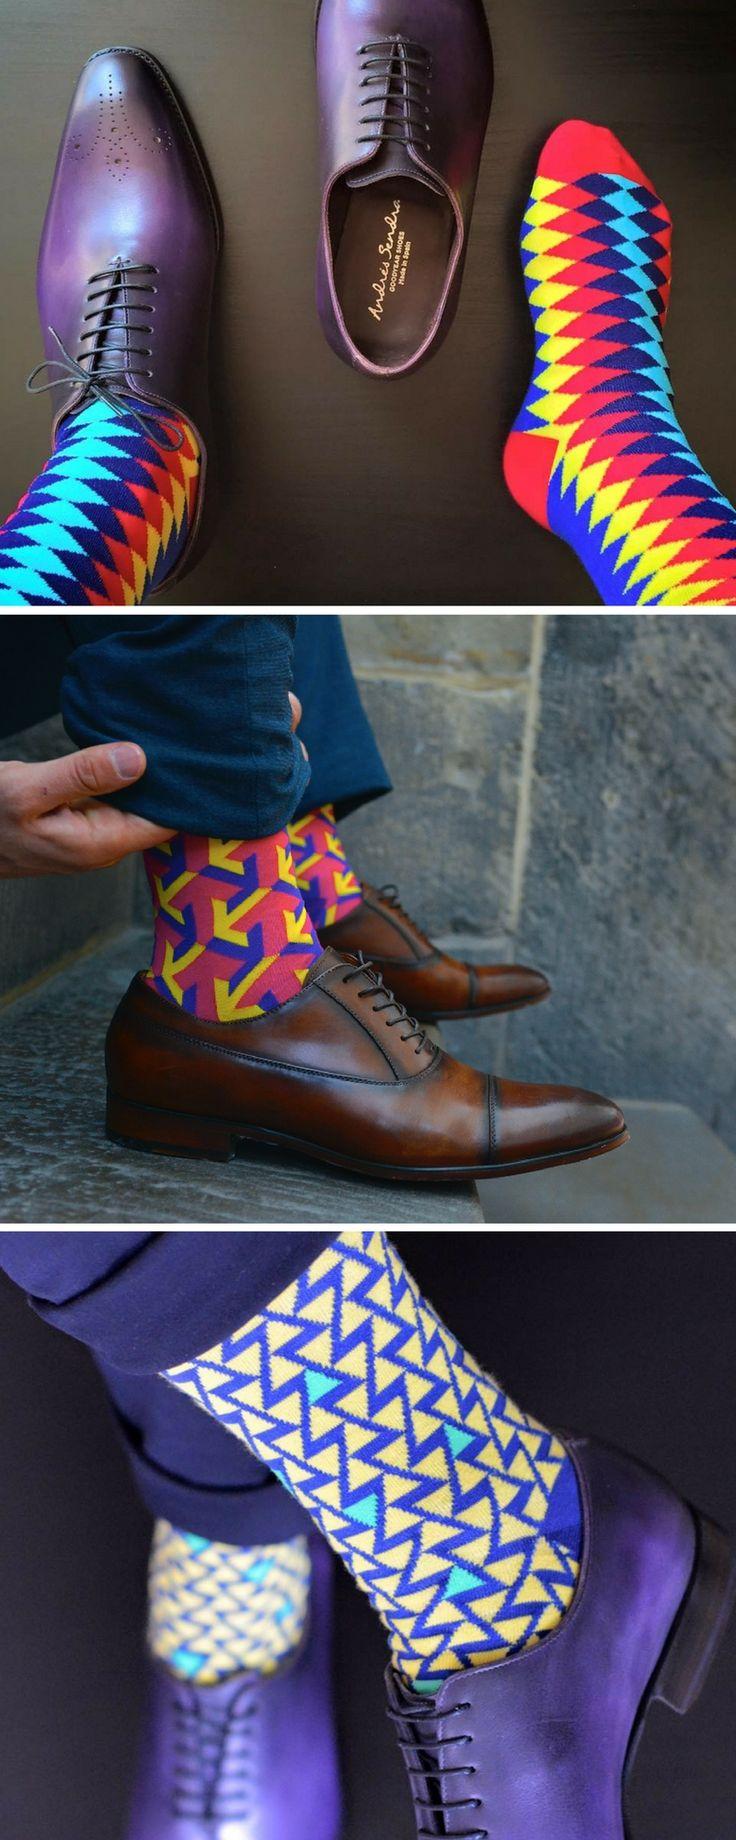 Sock game compliments guaranteed. Soxy.com designs the coolest, most fun dress socks. . . . . . der Blog für den Gentleman - www.thegentlemanclub.de/blog